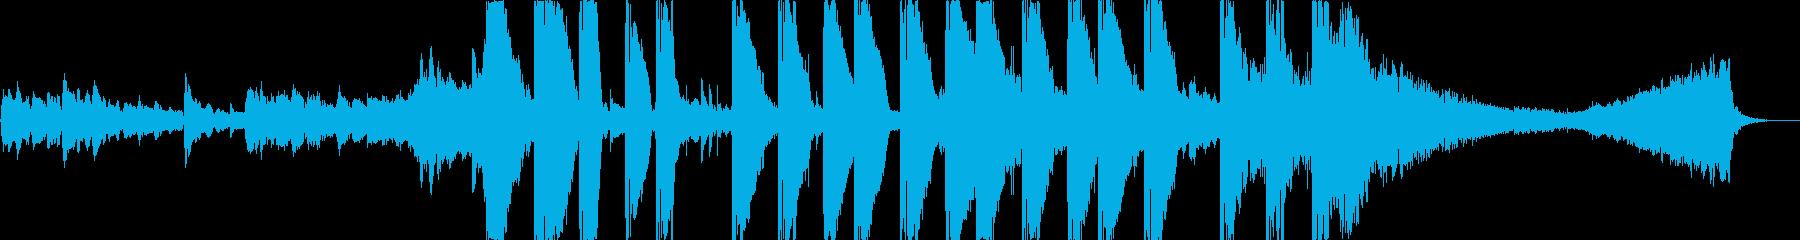 HIPHOPとオーケストラの融合アジア風の再生済みの波形